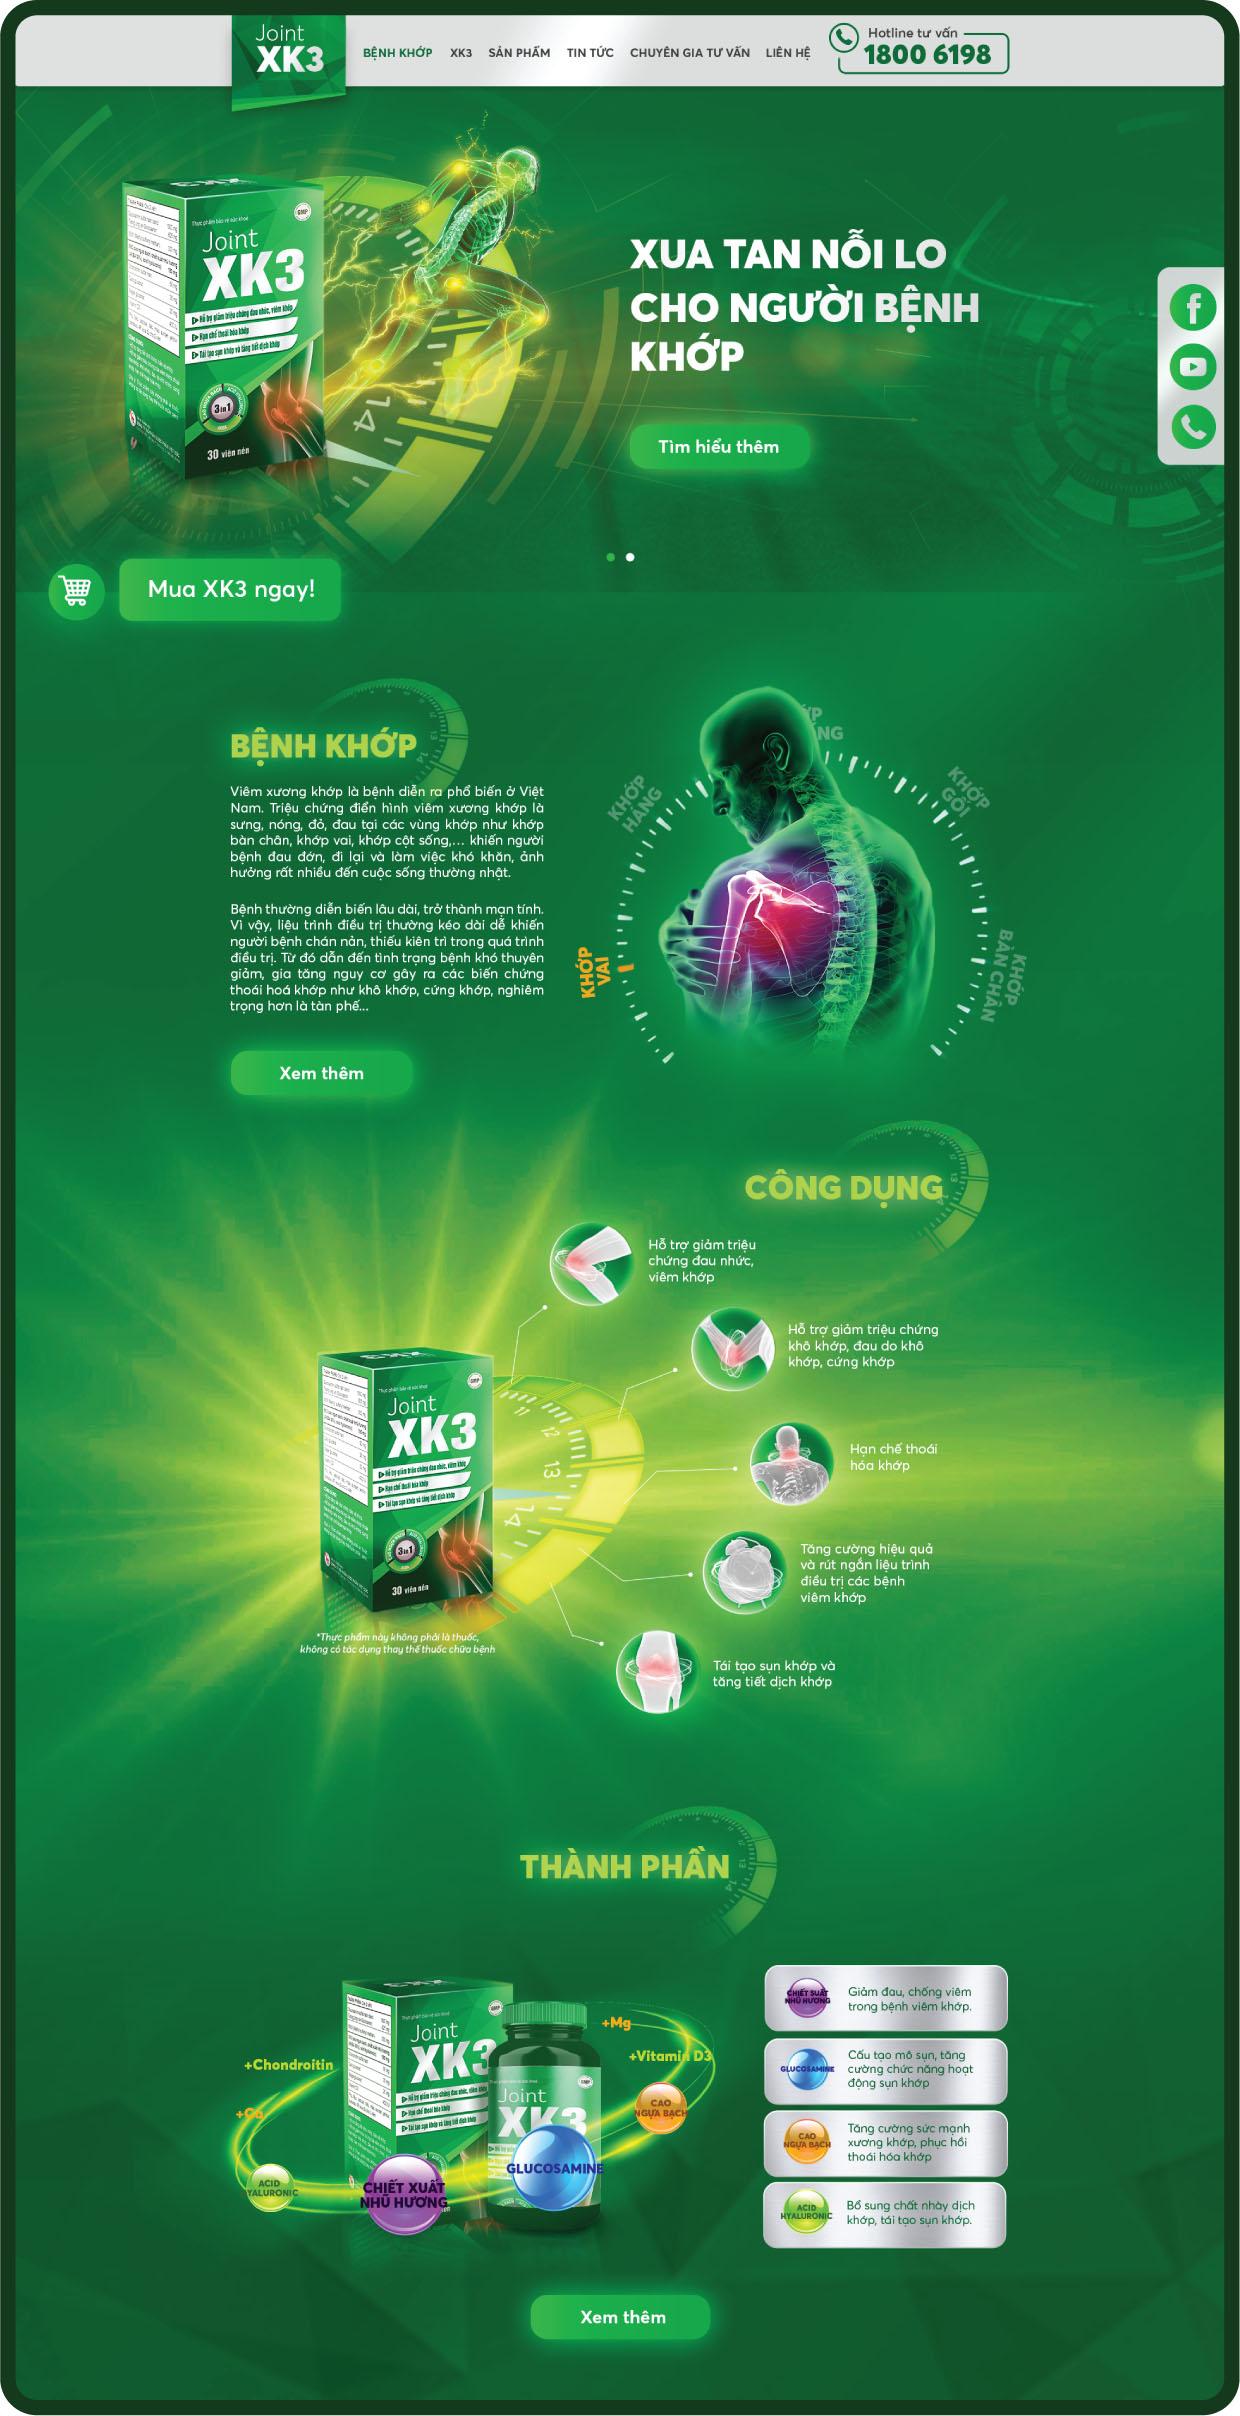 XK3.Homepage